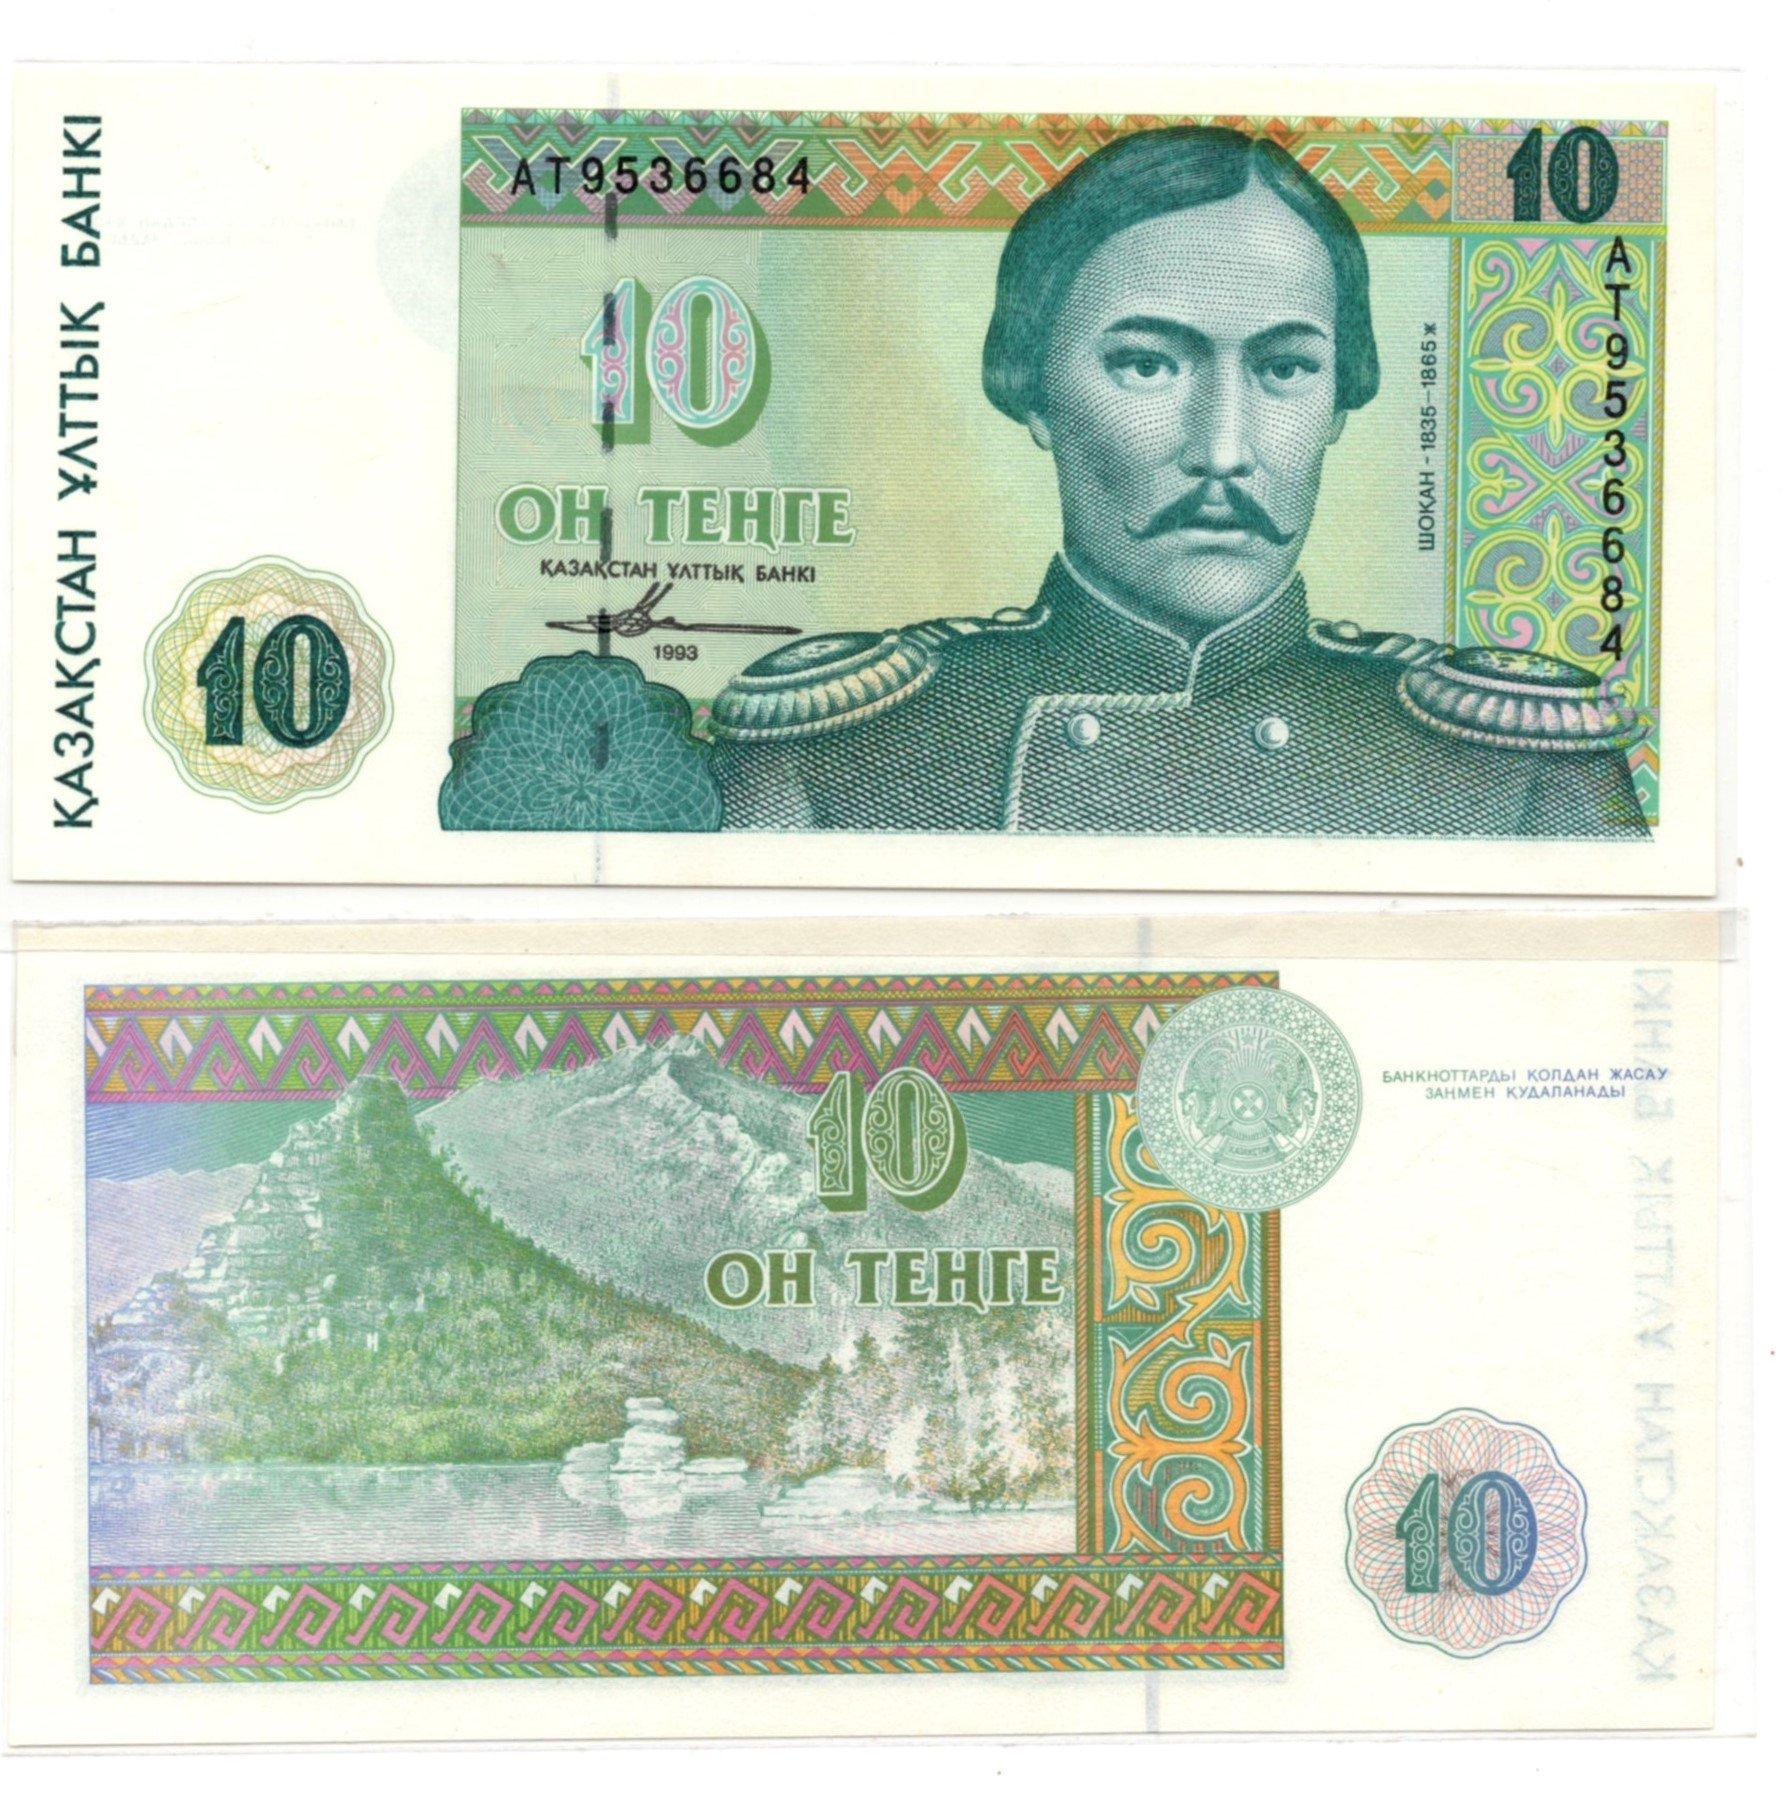 kazahstan 10 tenge